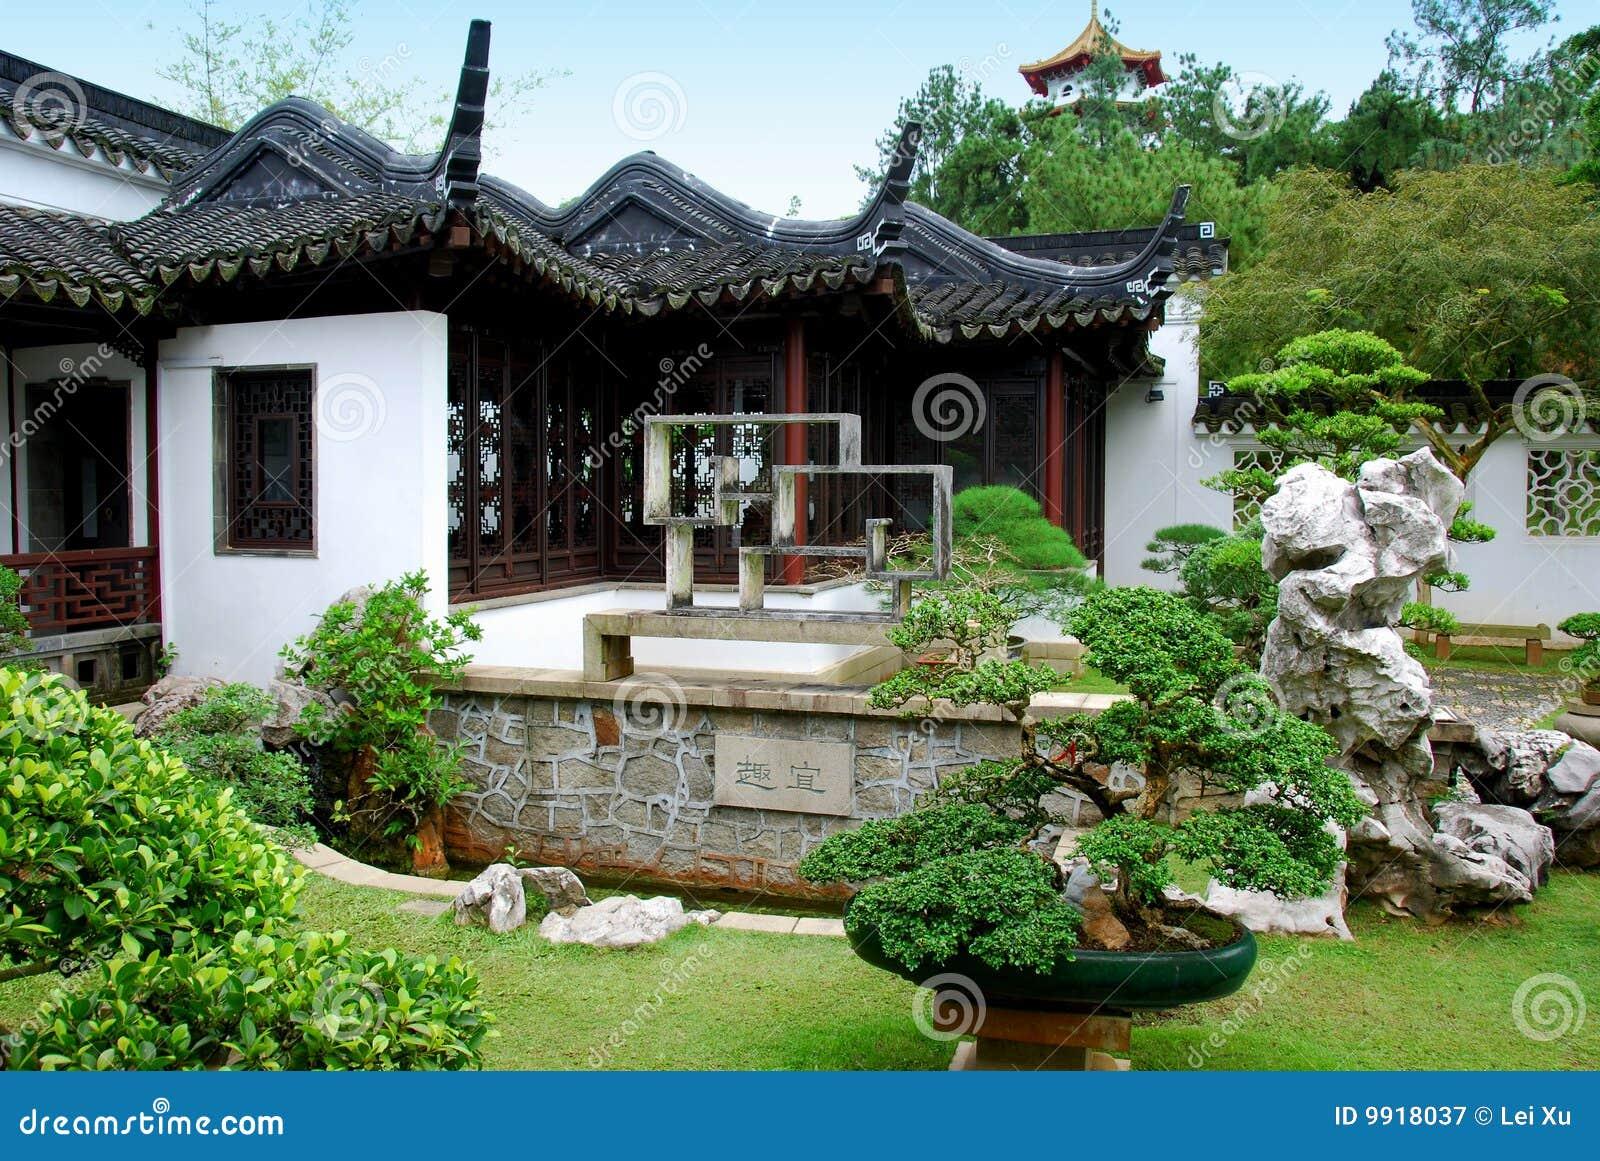 Singapore de tuin van de bonsai bij de chinese tuin royalty vrije stock fotografie beeld 9918037 - Tuin van de tuin ...